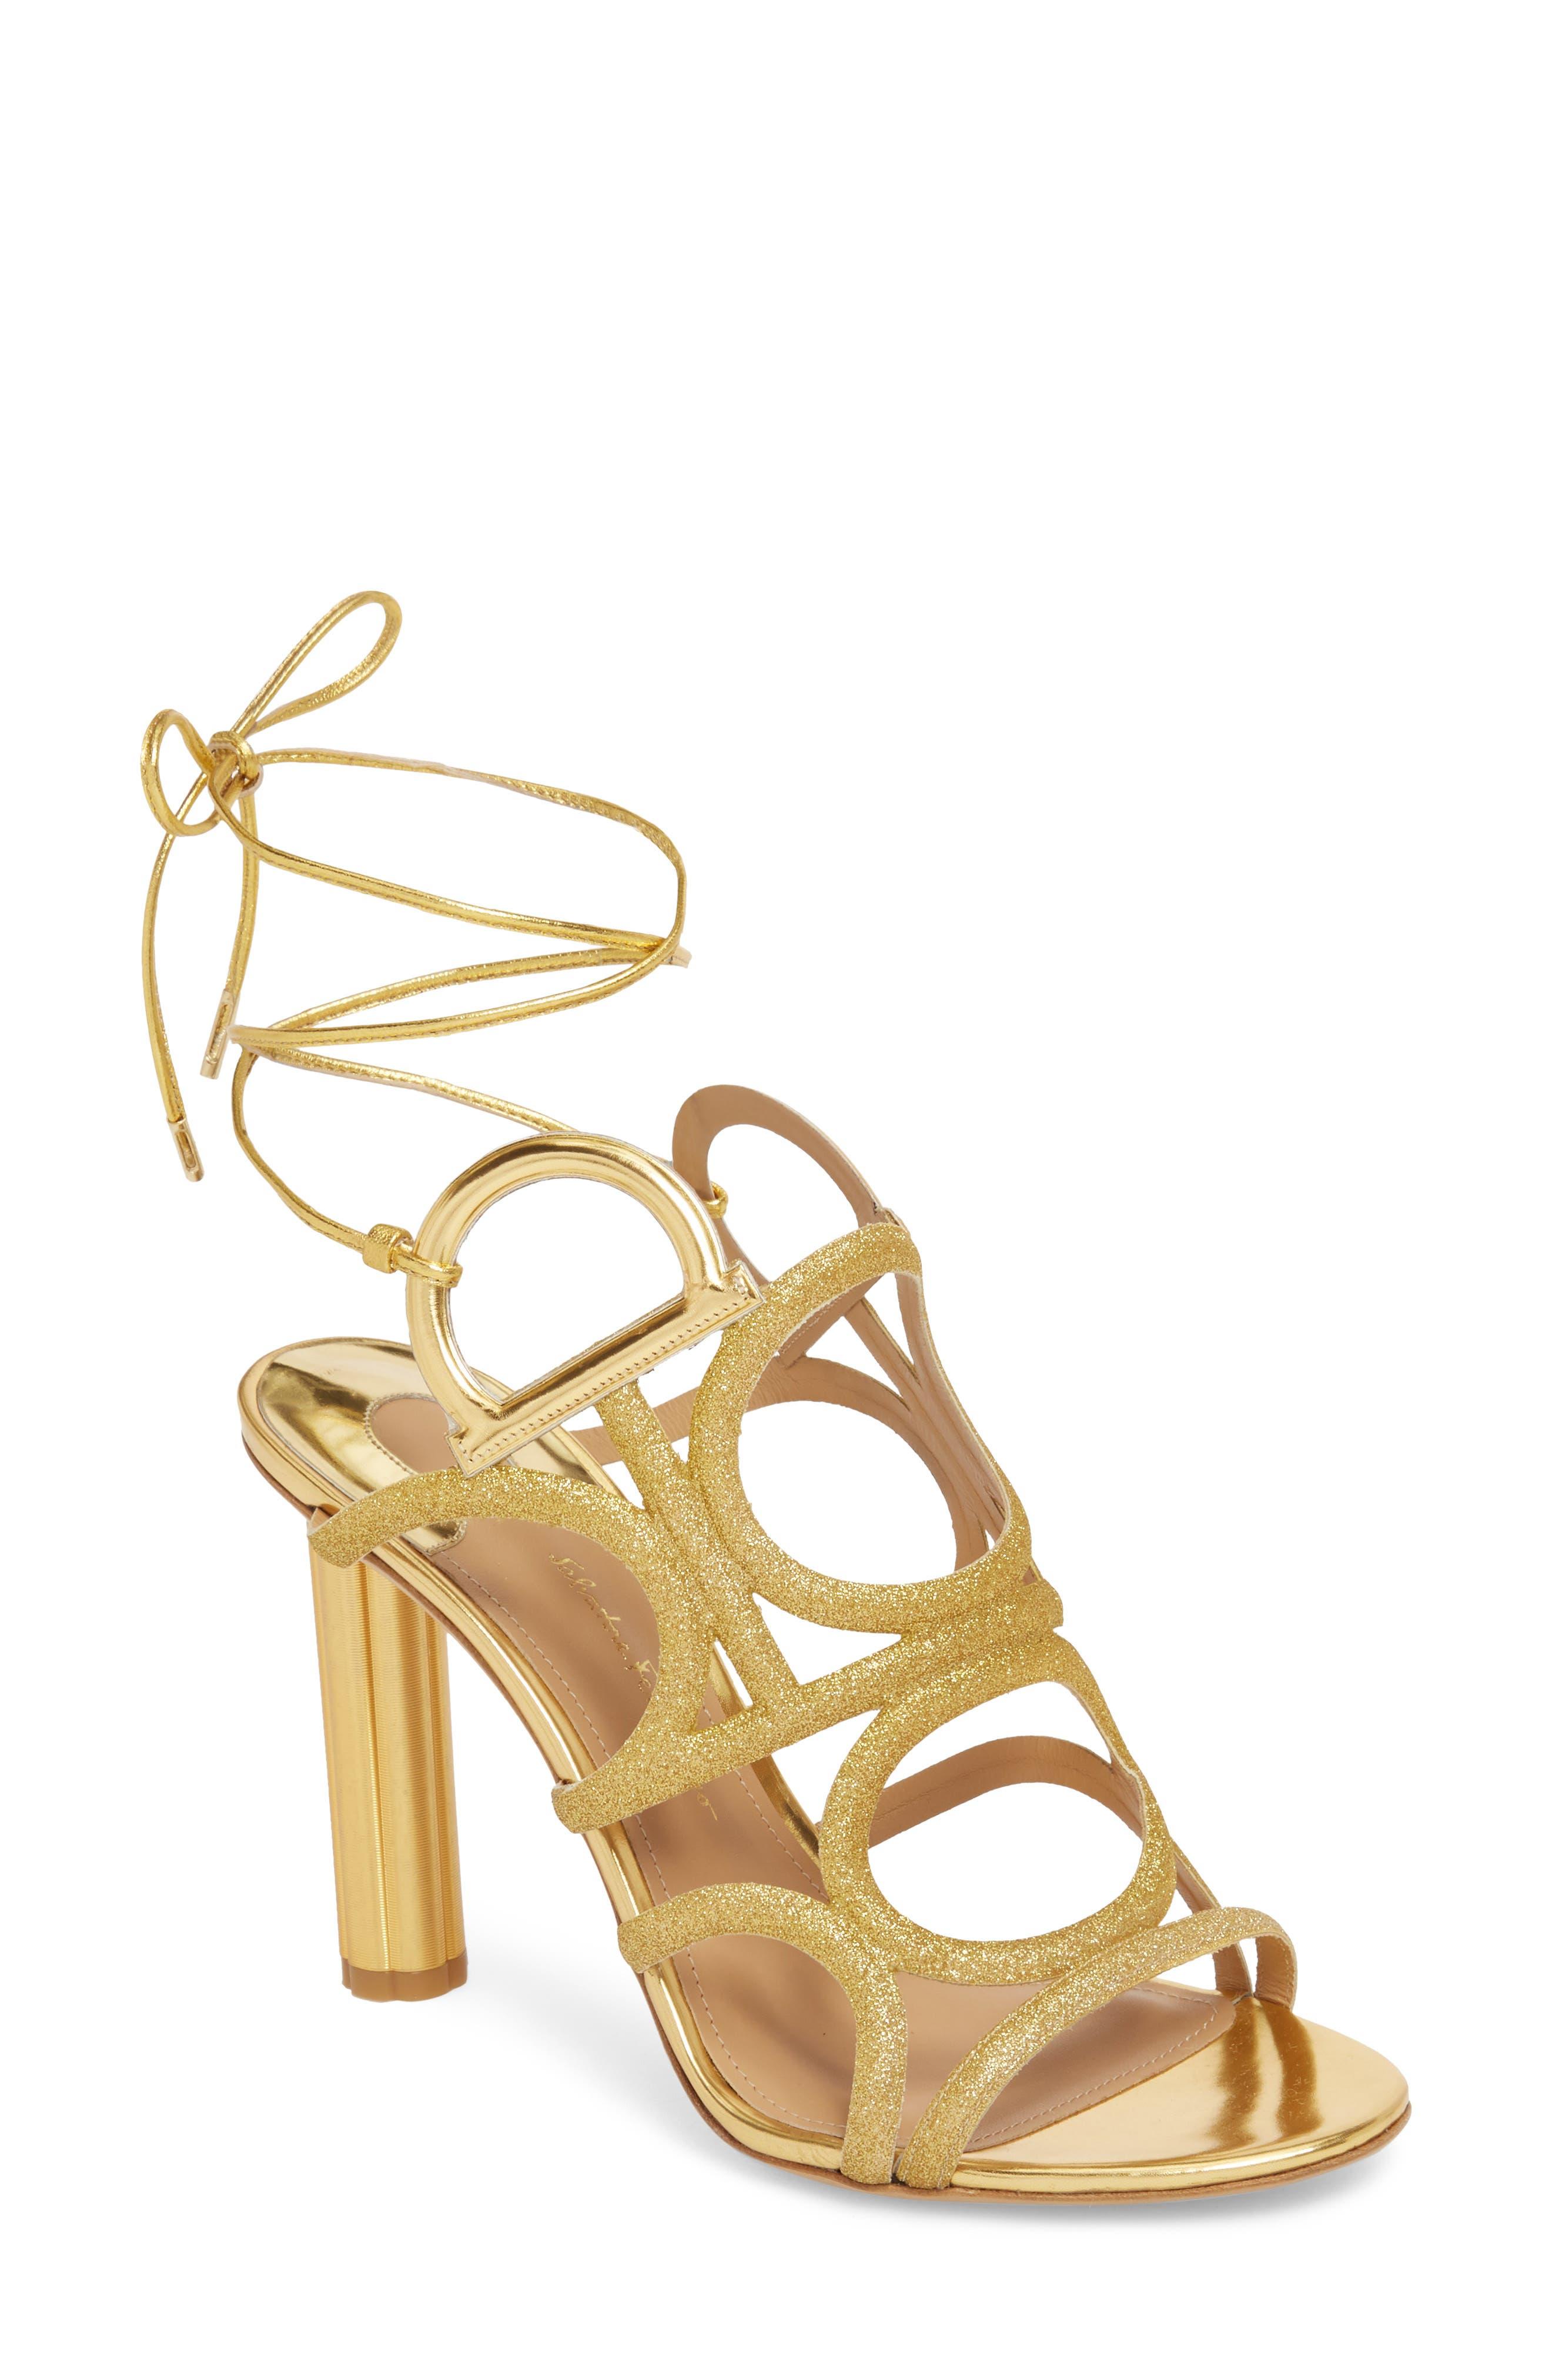 Vinci Lace-Up Heeled Sandal,                             Main thumbnail 1, color,                             710